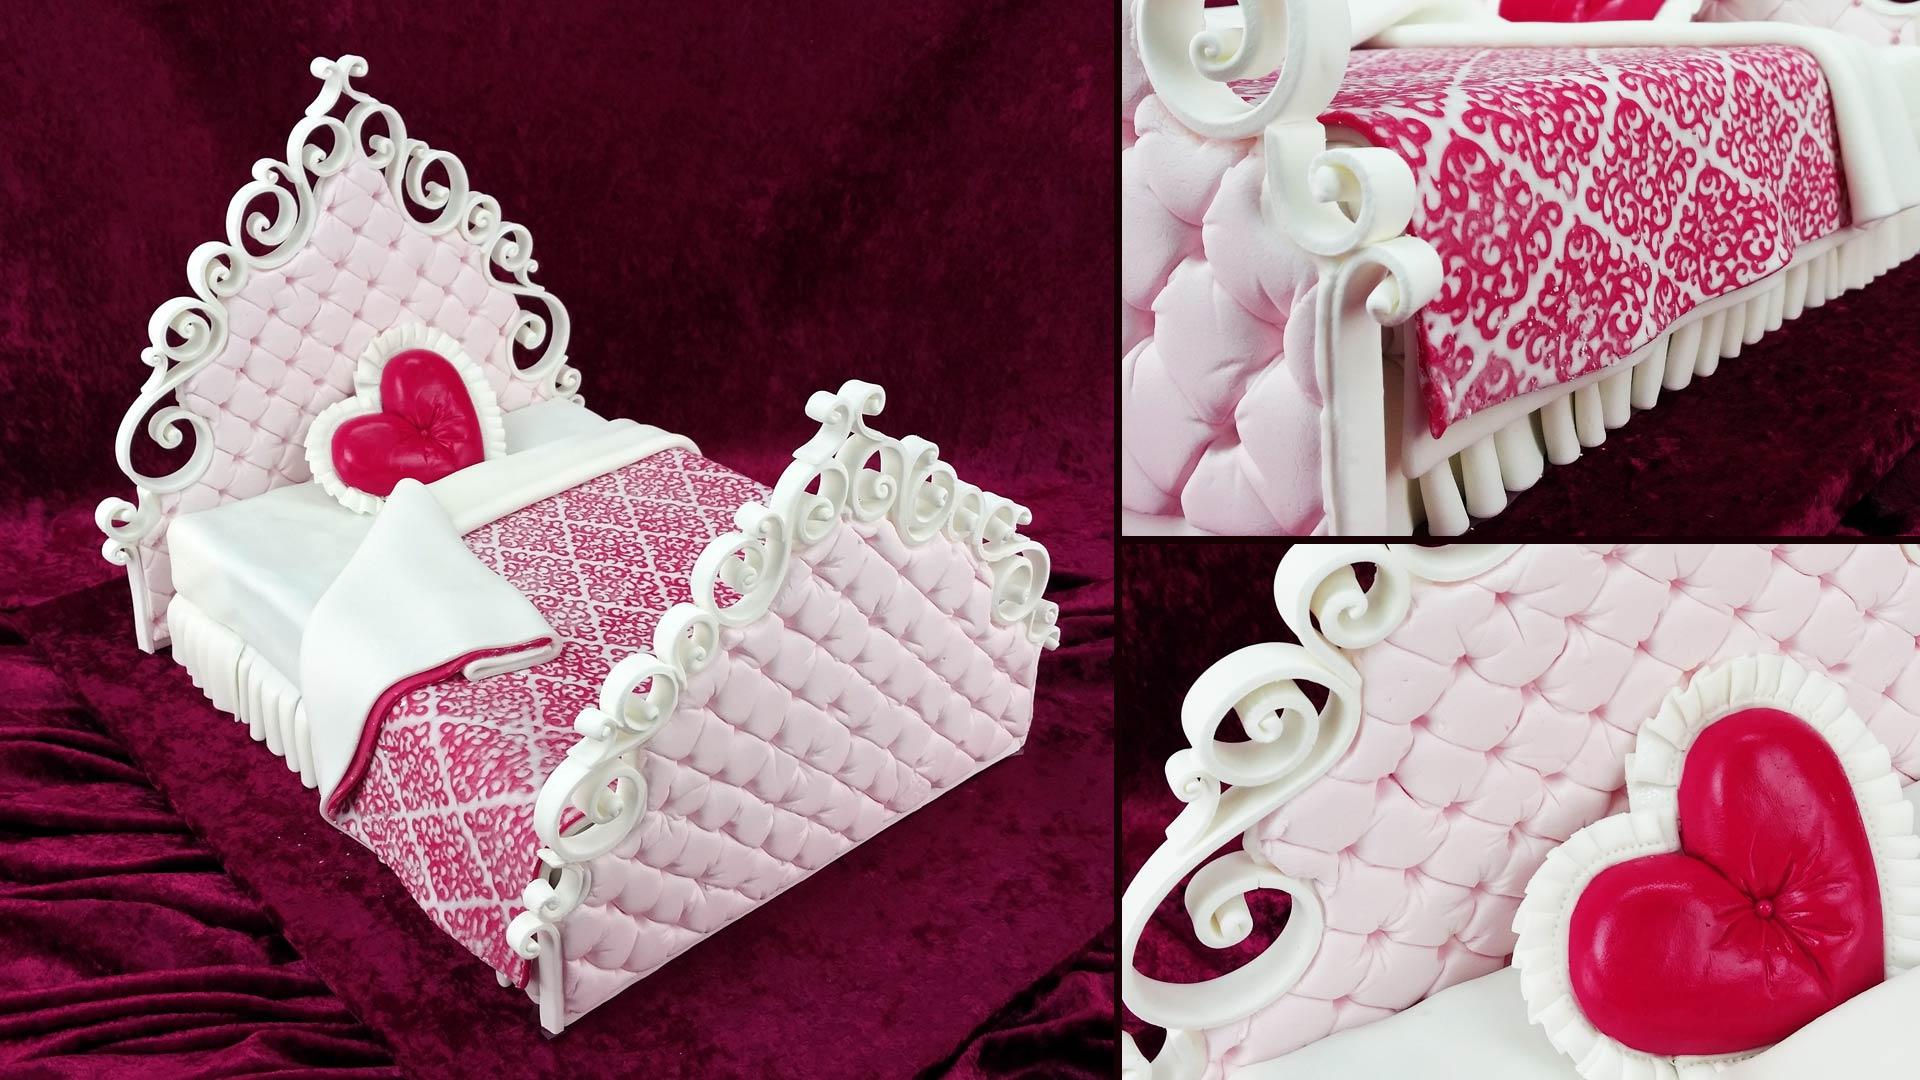 Valentines Bed Cake Yeners Way